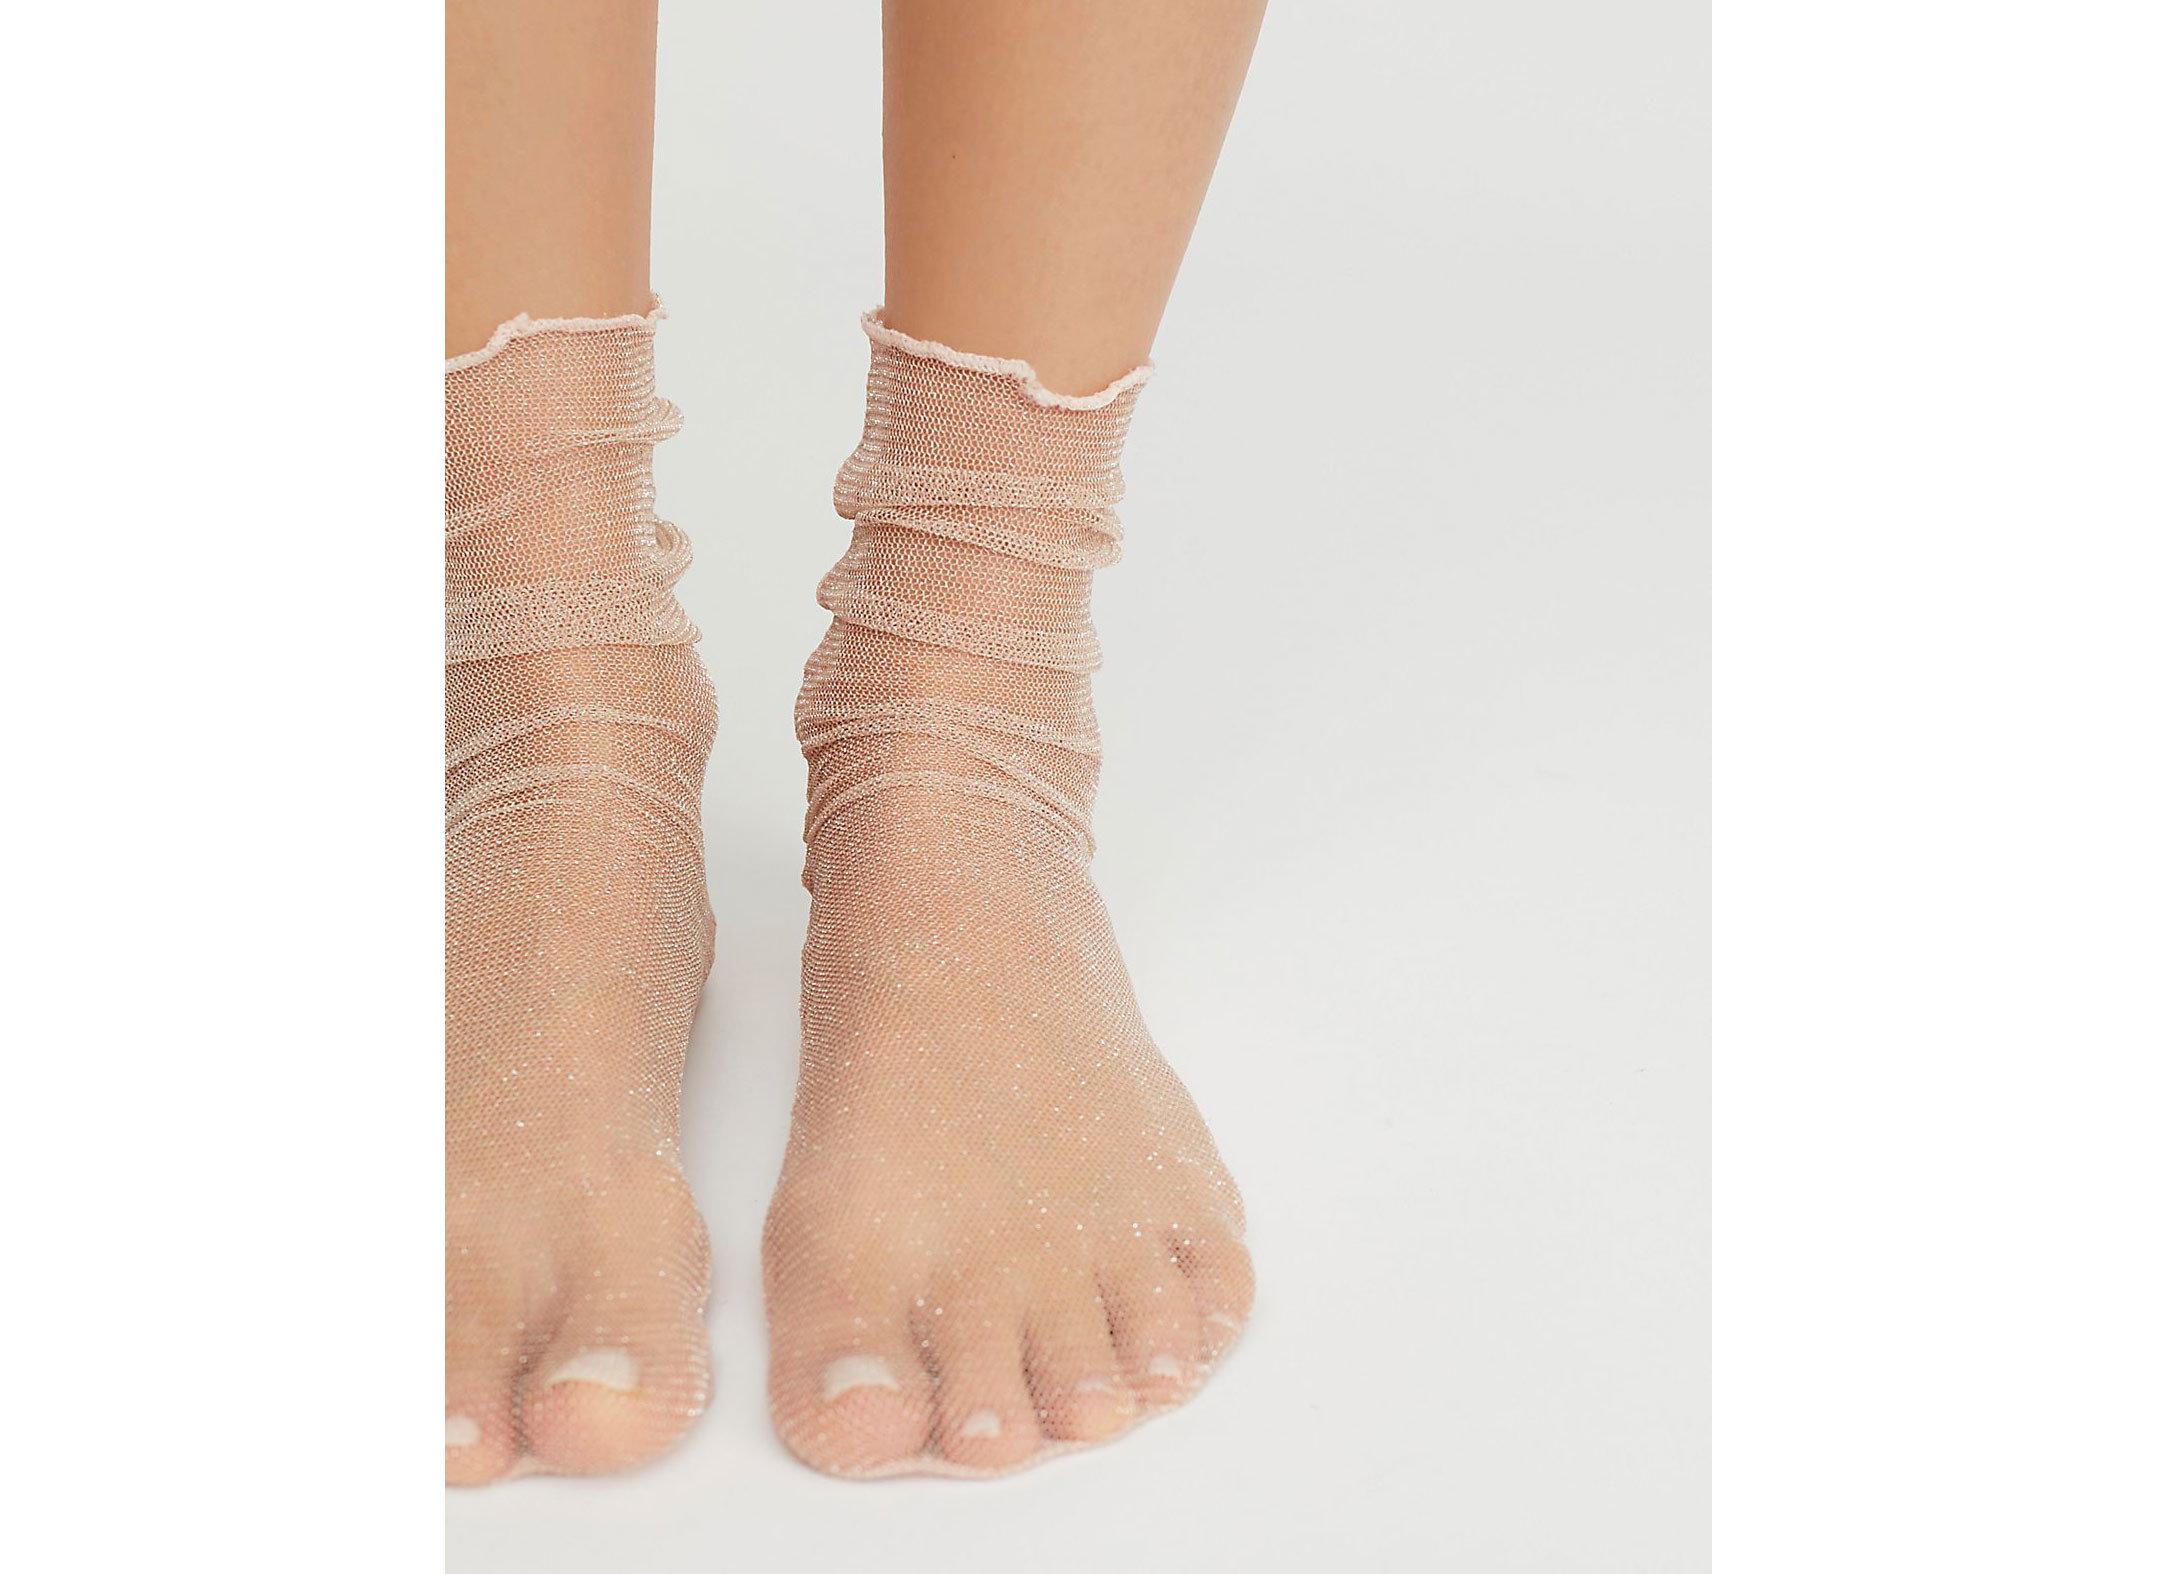 Travel Shop Travel Trends joint human leg ankle leg foot bandage arm hand toe finger barefoot shoe beige accessory